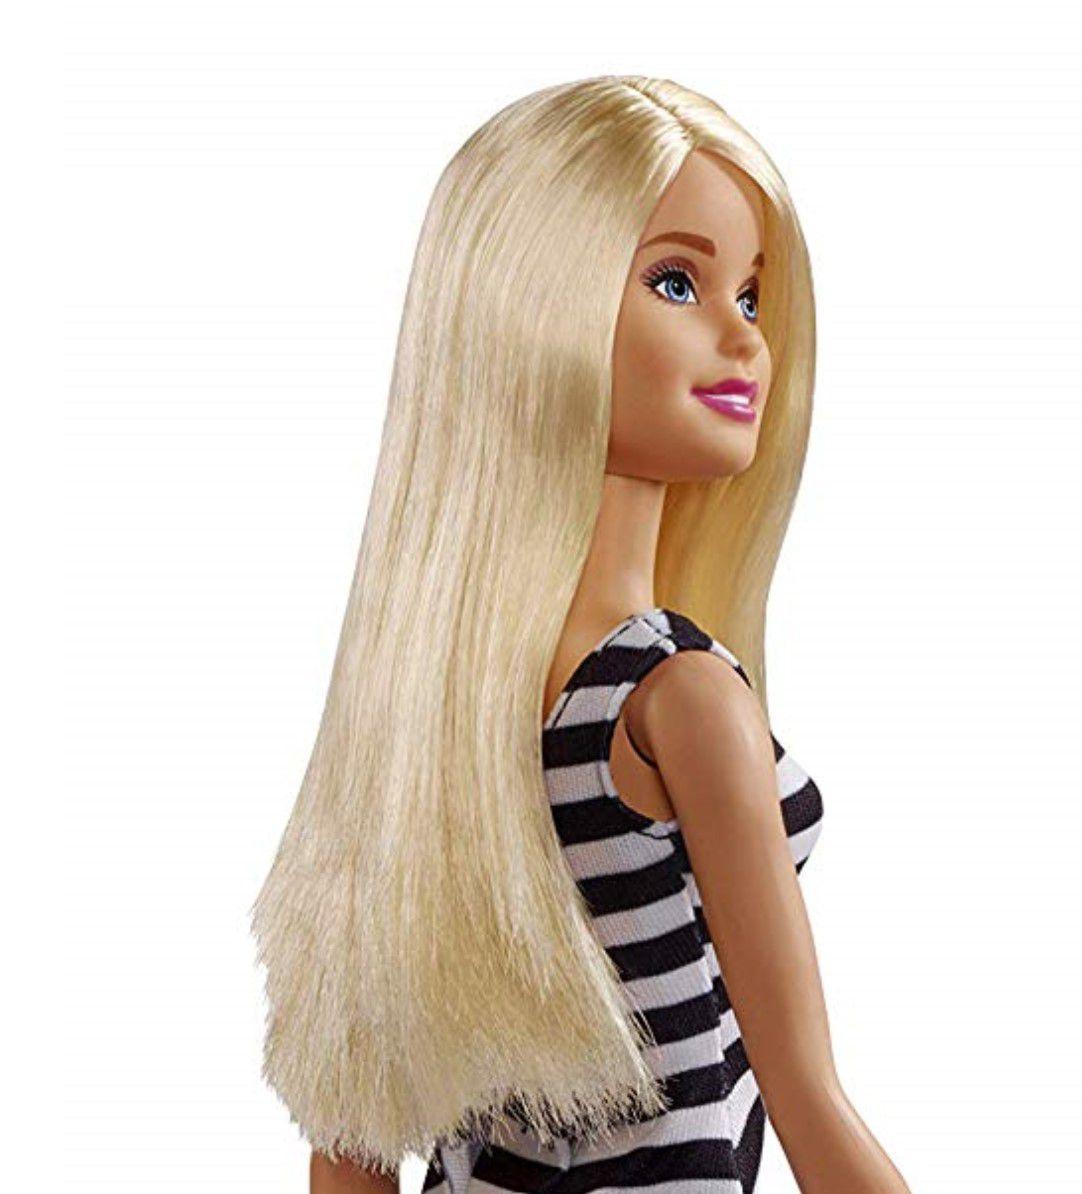 Boneca Barbie Loira Básica Glitz Vestido Branco E Preto